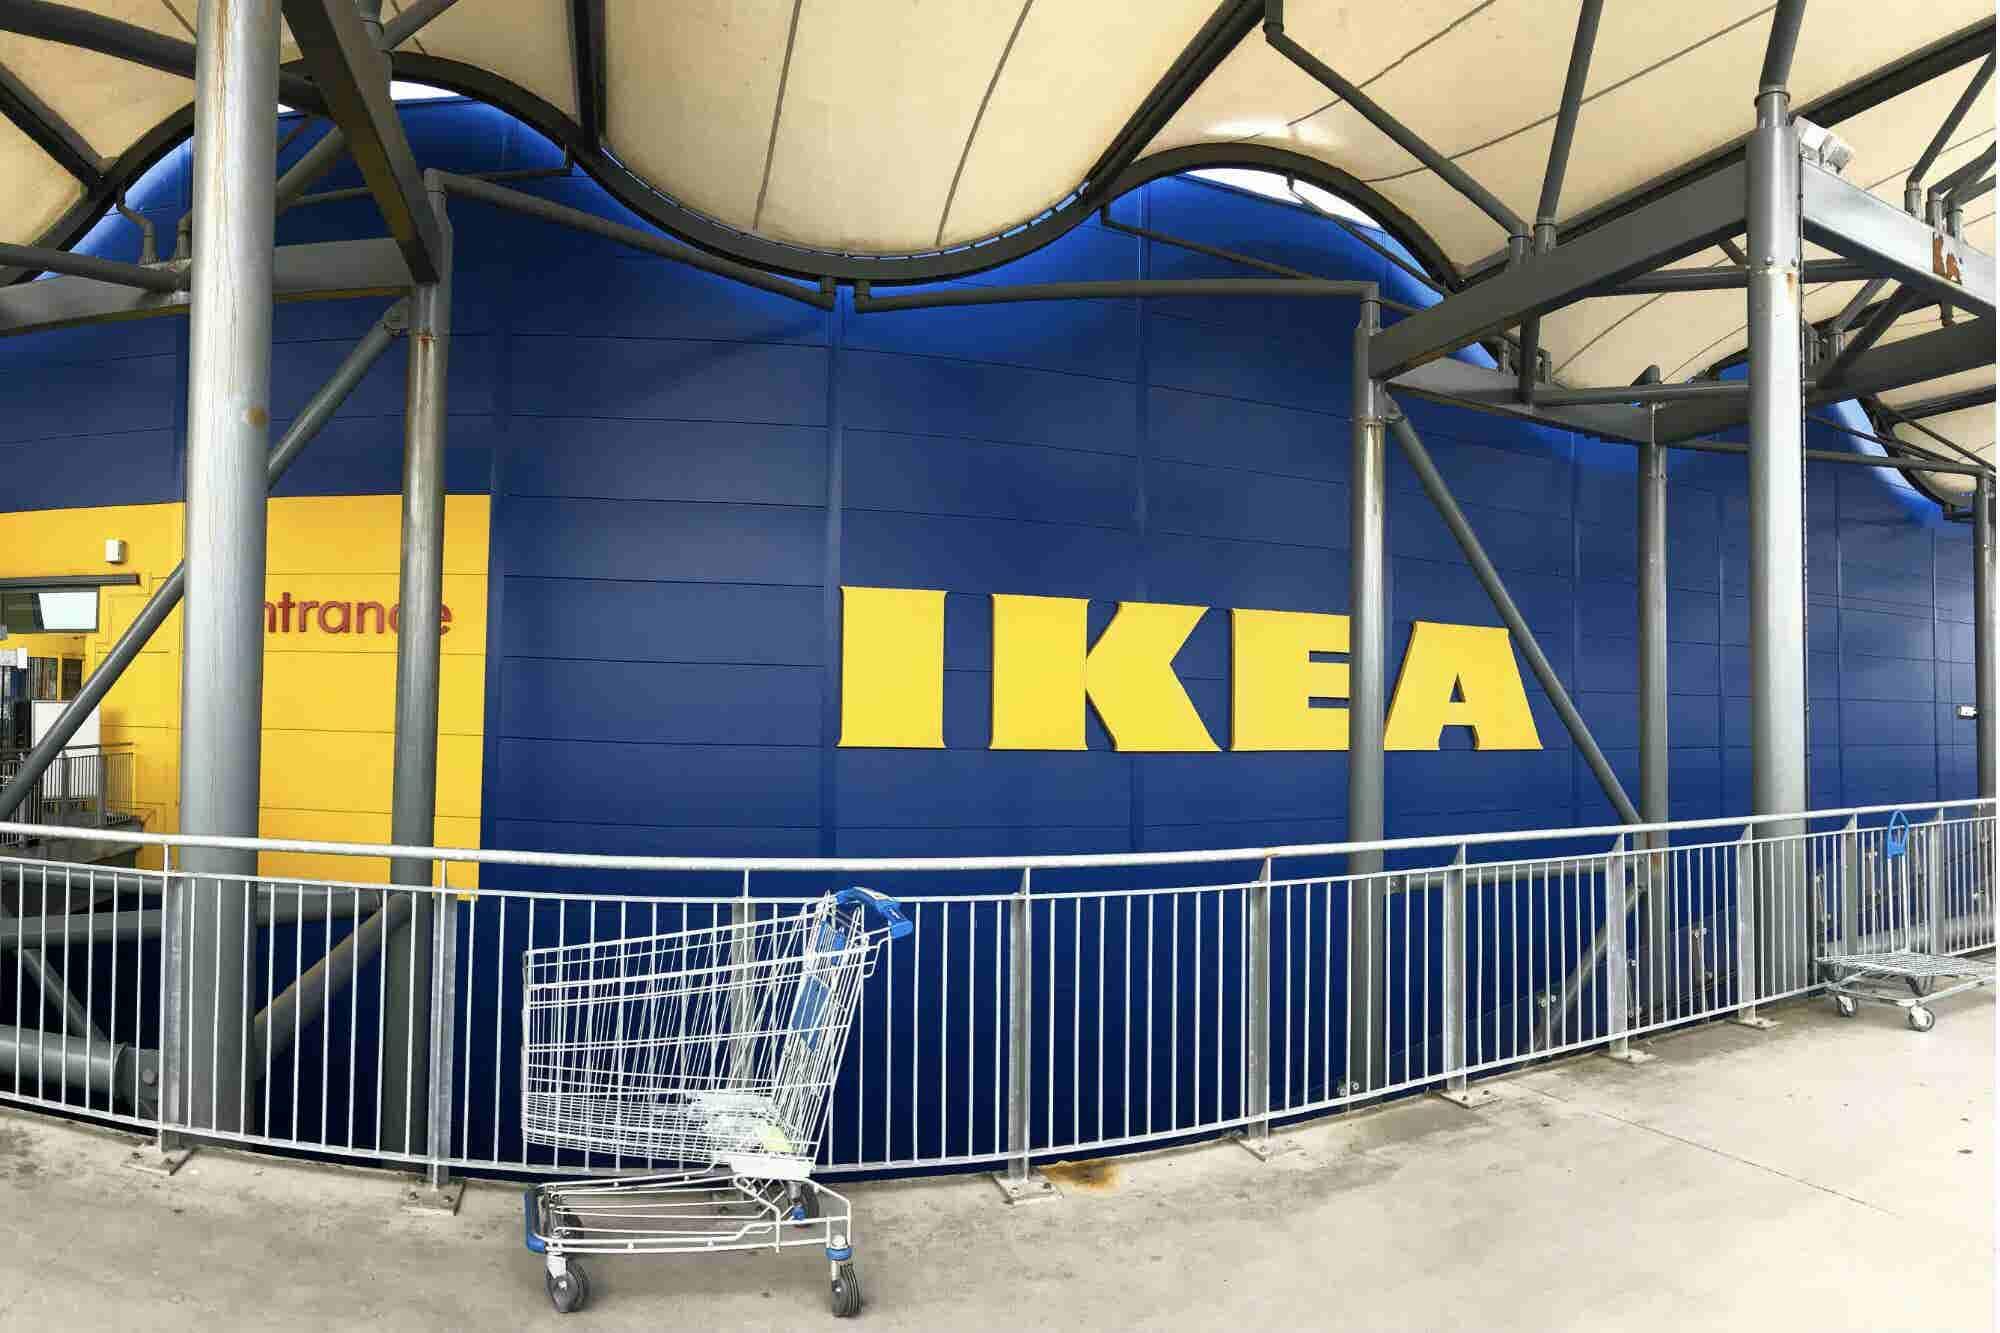 IKEA llega a México y está buscando empleados